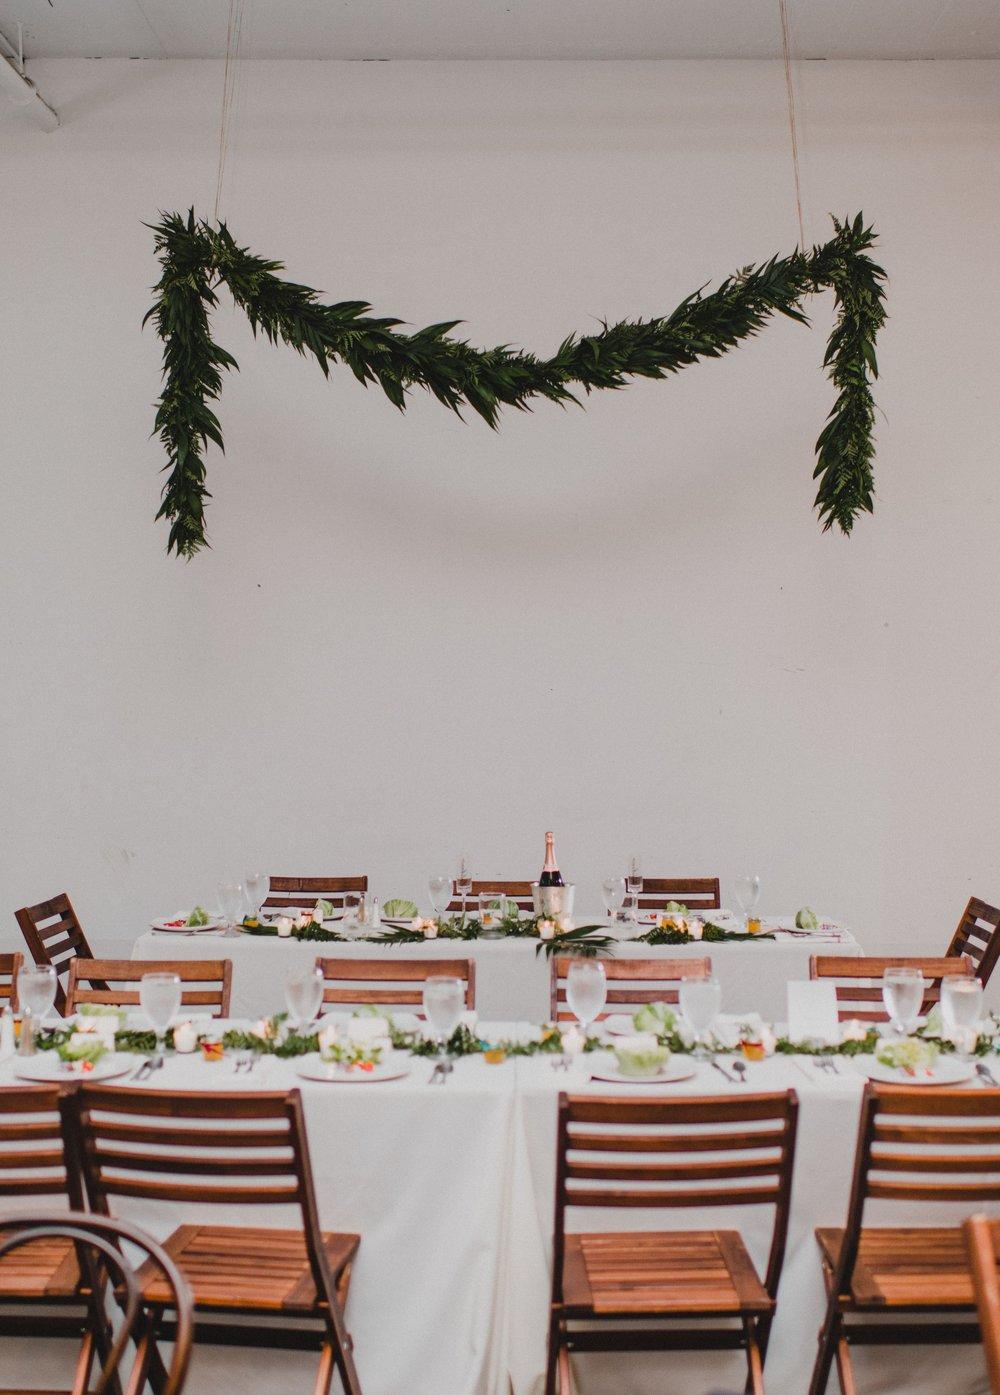 Cleveland-Red-Space-Wedding-AllisonJarus+RoryMcGlynn-Mallory+JustinPhoto-542 copy.jpeg